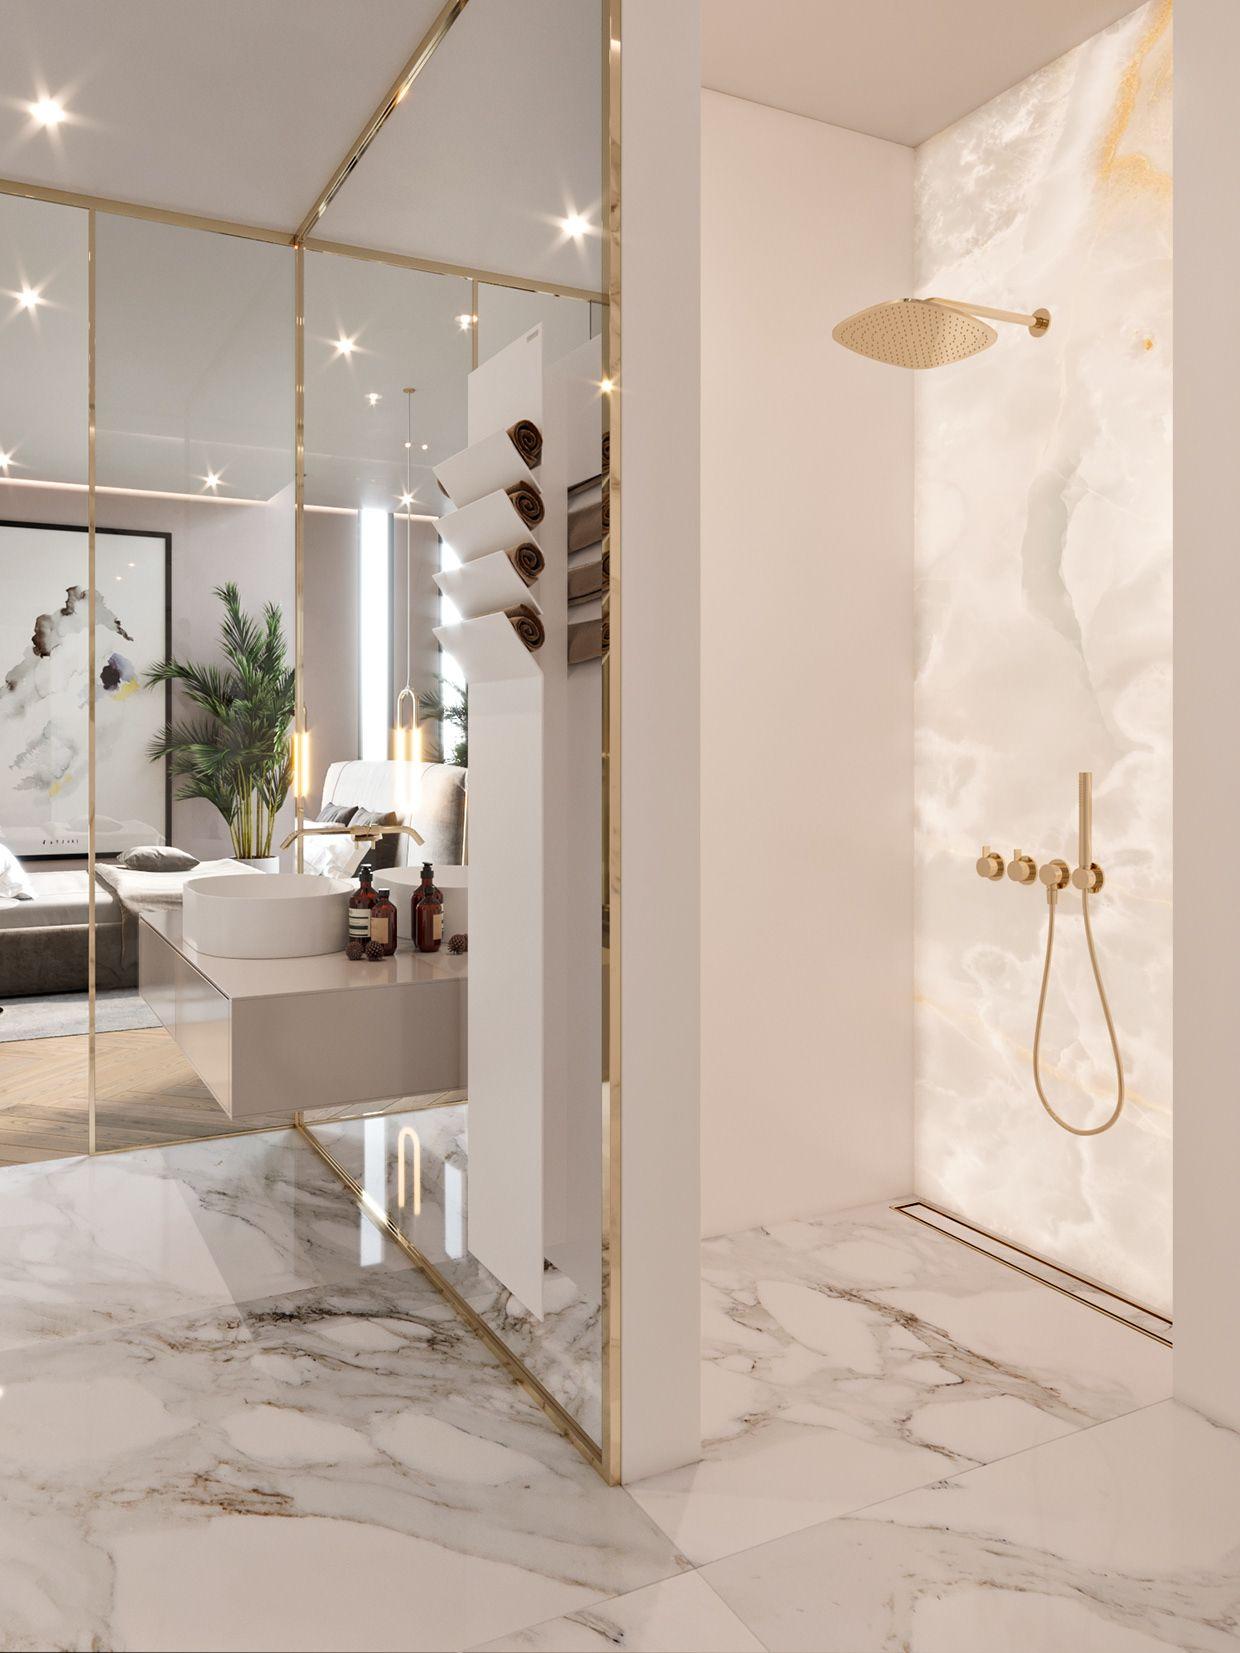 Badezimmer lux | Badezimmer design, Luxuriöses badezimmer ...